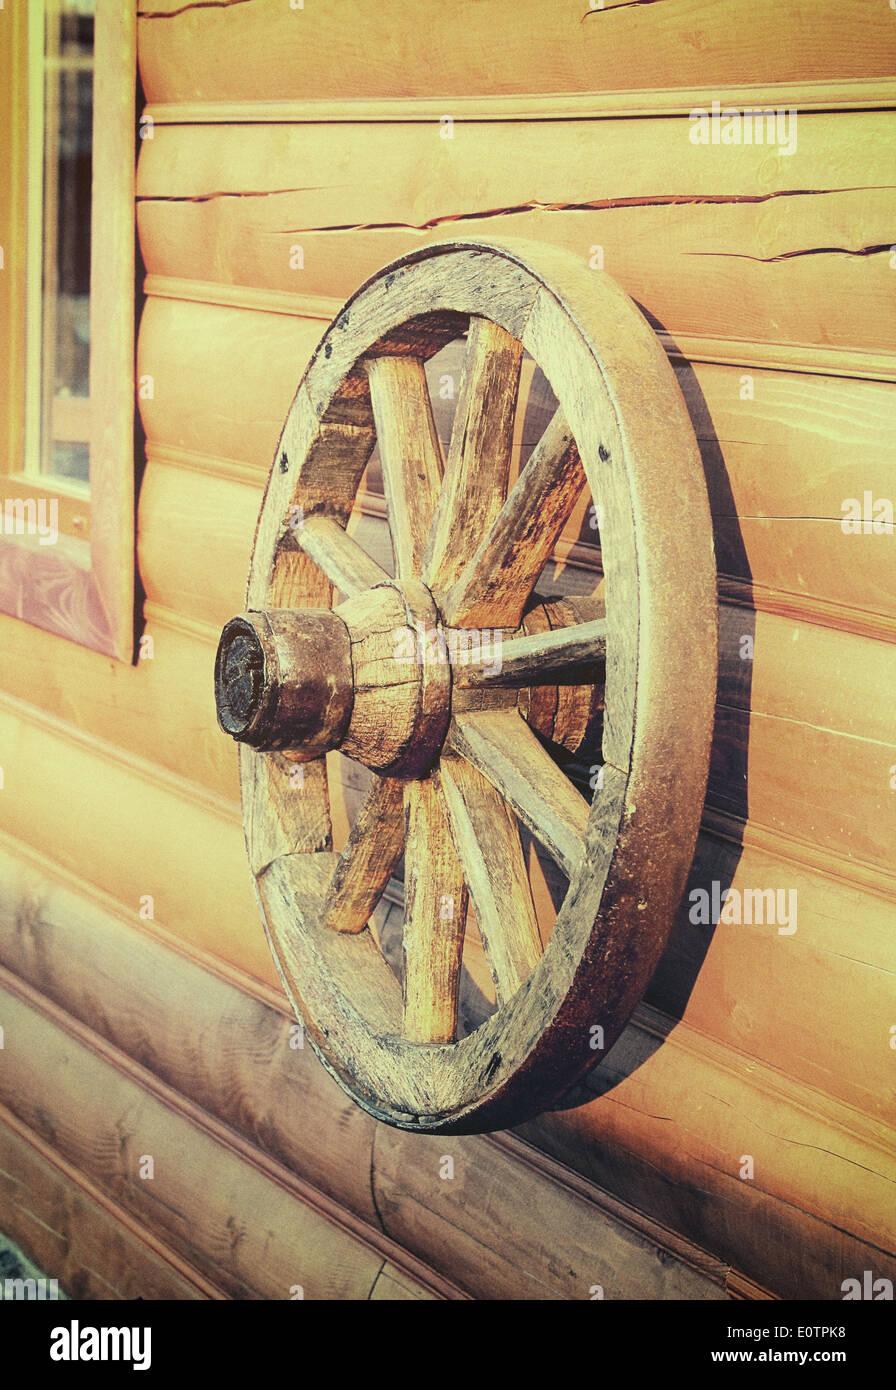 Ancient Wooden Cart Stock Photos & Ancient Wooden Cart Stock Images ...